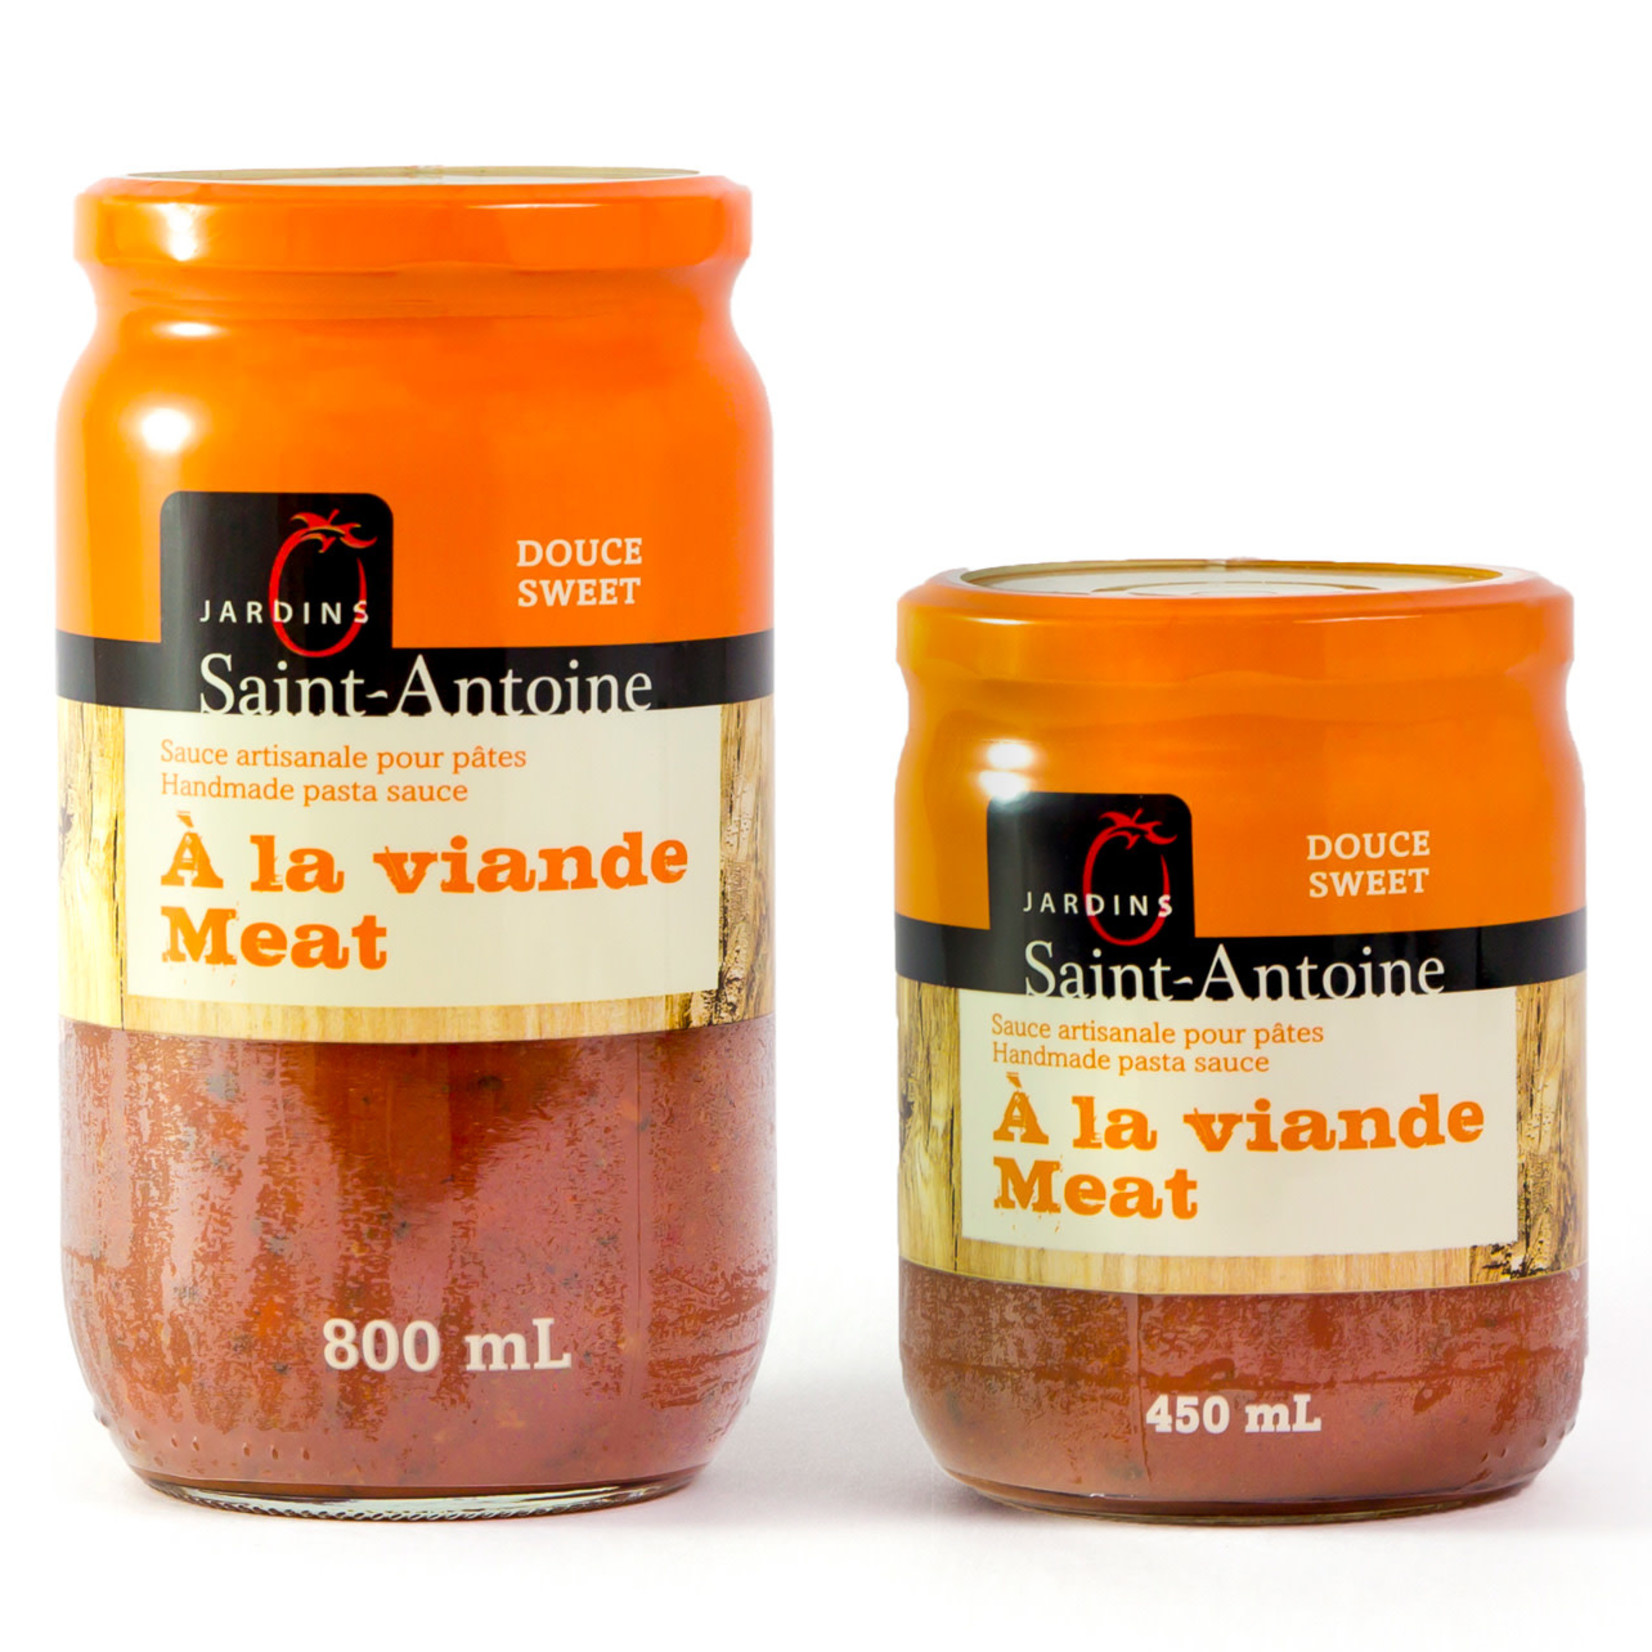 Jardin Saint-Antoine Sauce Artisanale à la viande DOUCE (800ml)